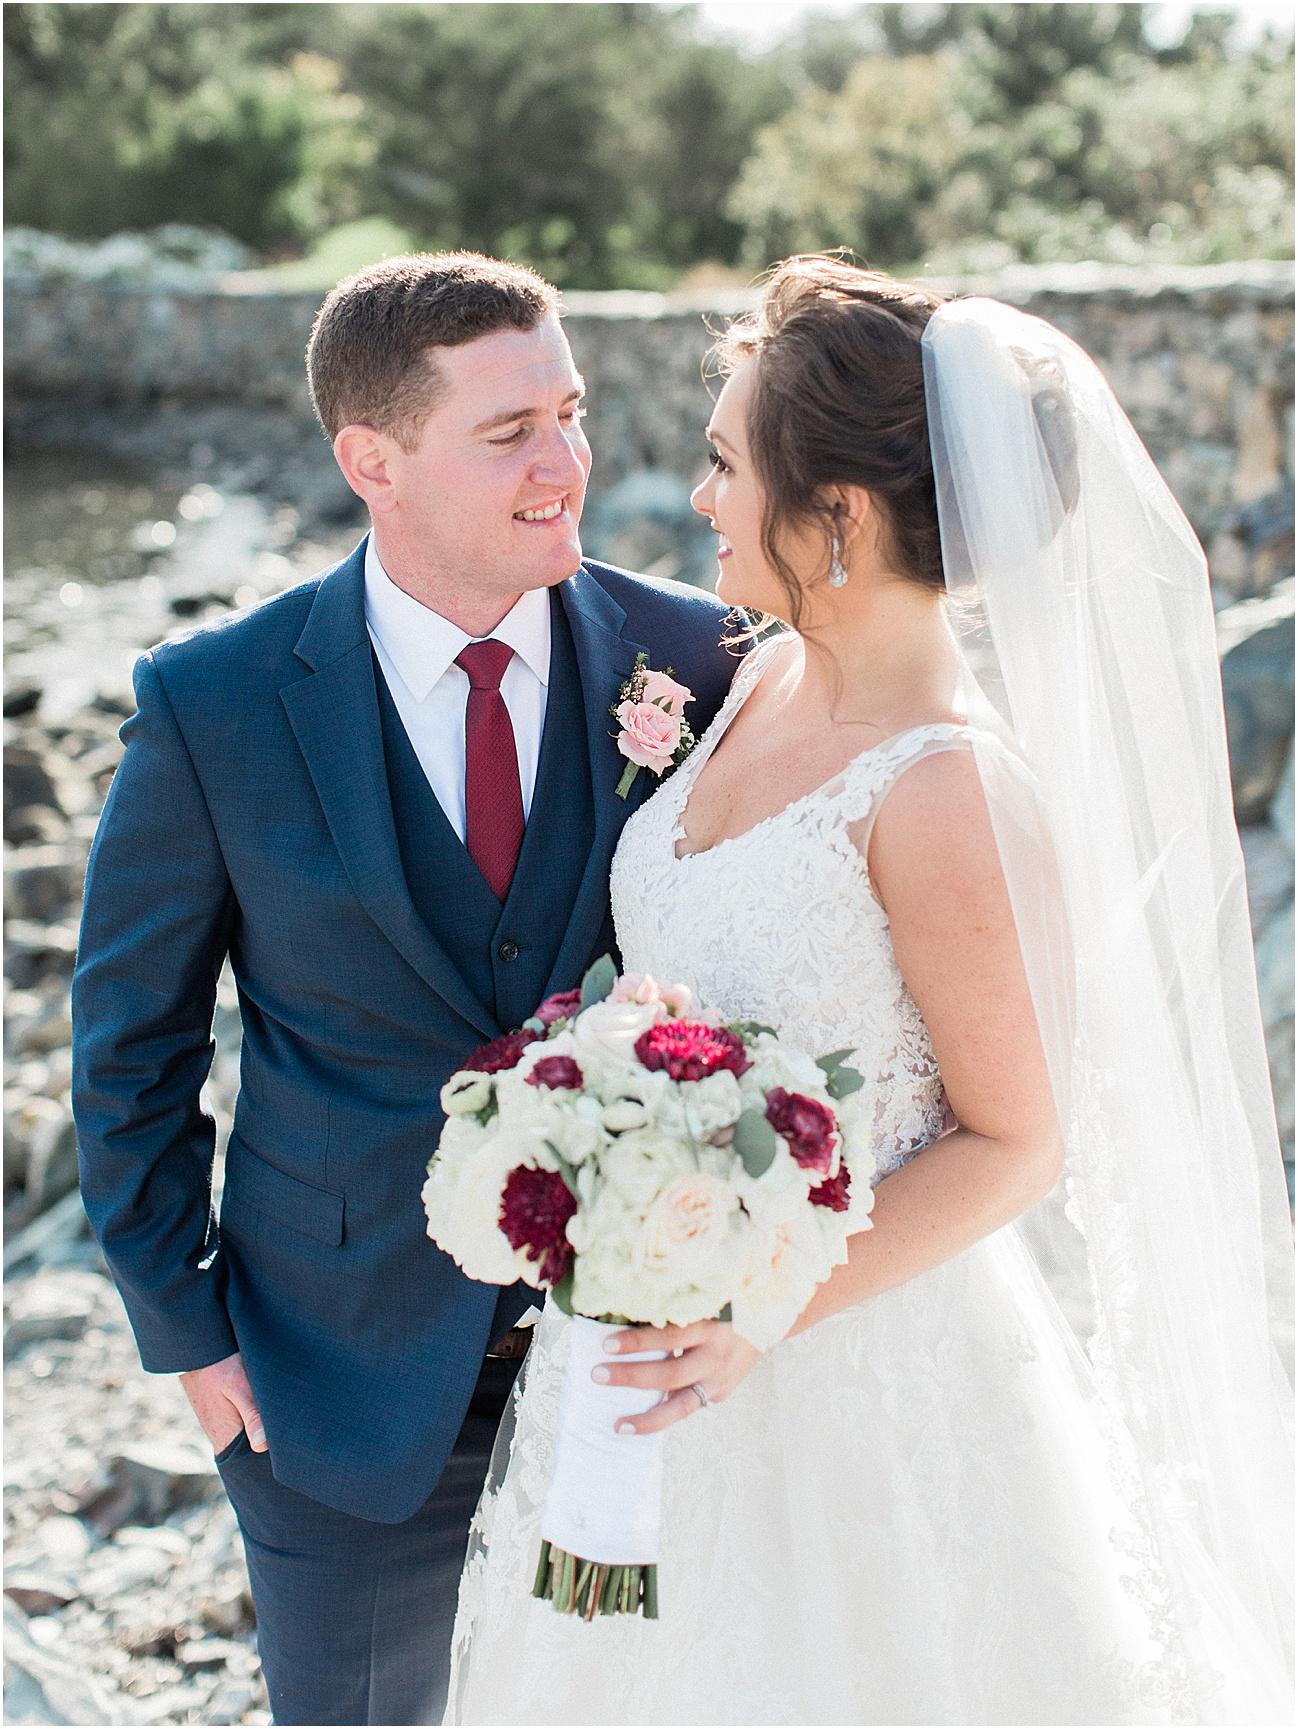 shannon_daniel_dan_atlantic_resort_saint_marys_st_mary_church_fall_newport_catholic_irish_cape_cod_boston_wedding_photographer_meredith_jane_photography_photo_1624.jpg